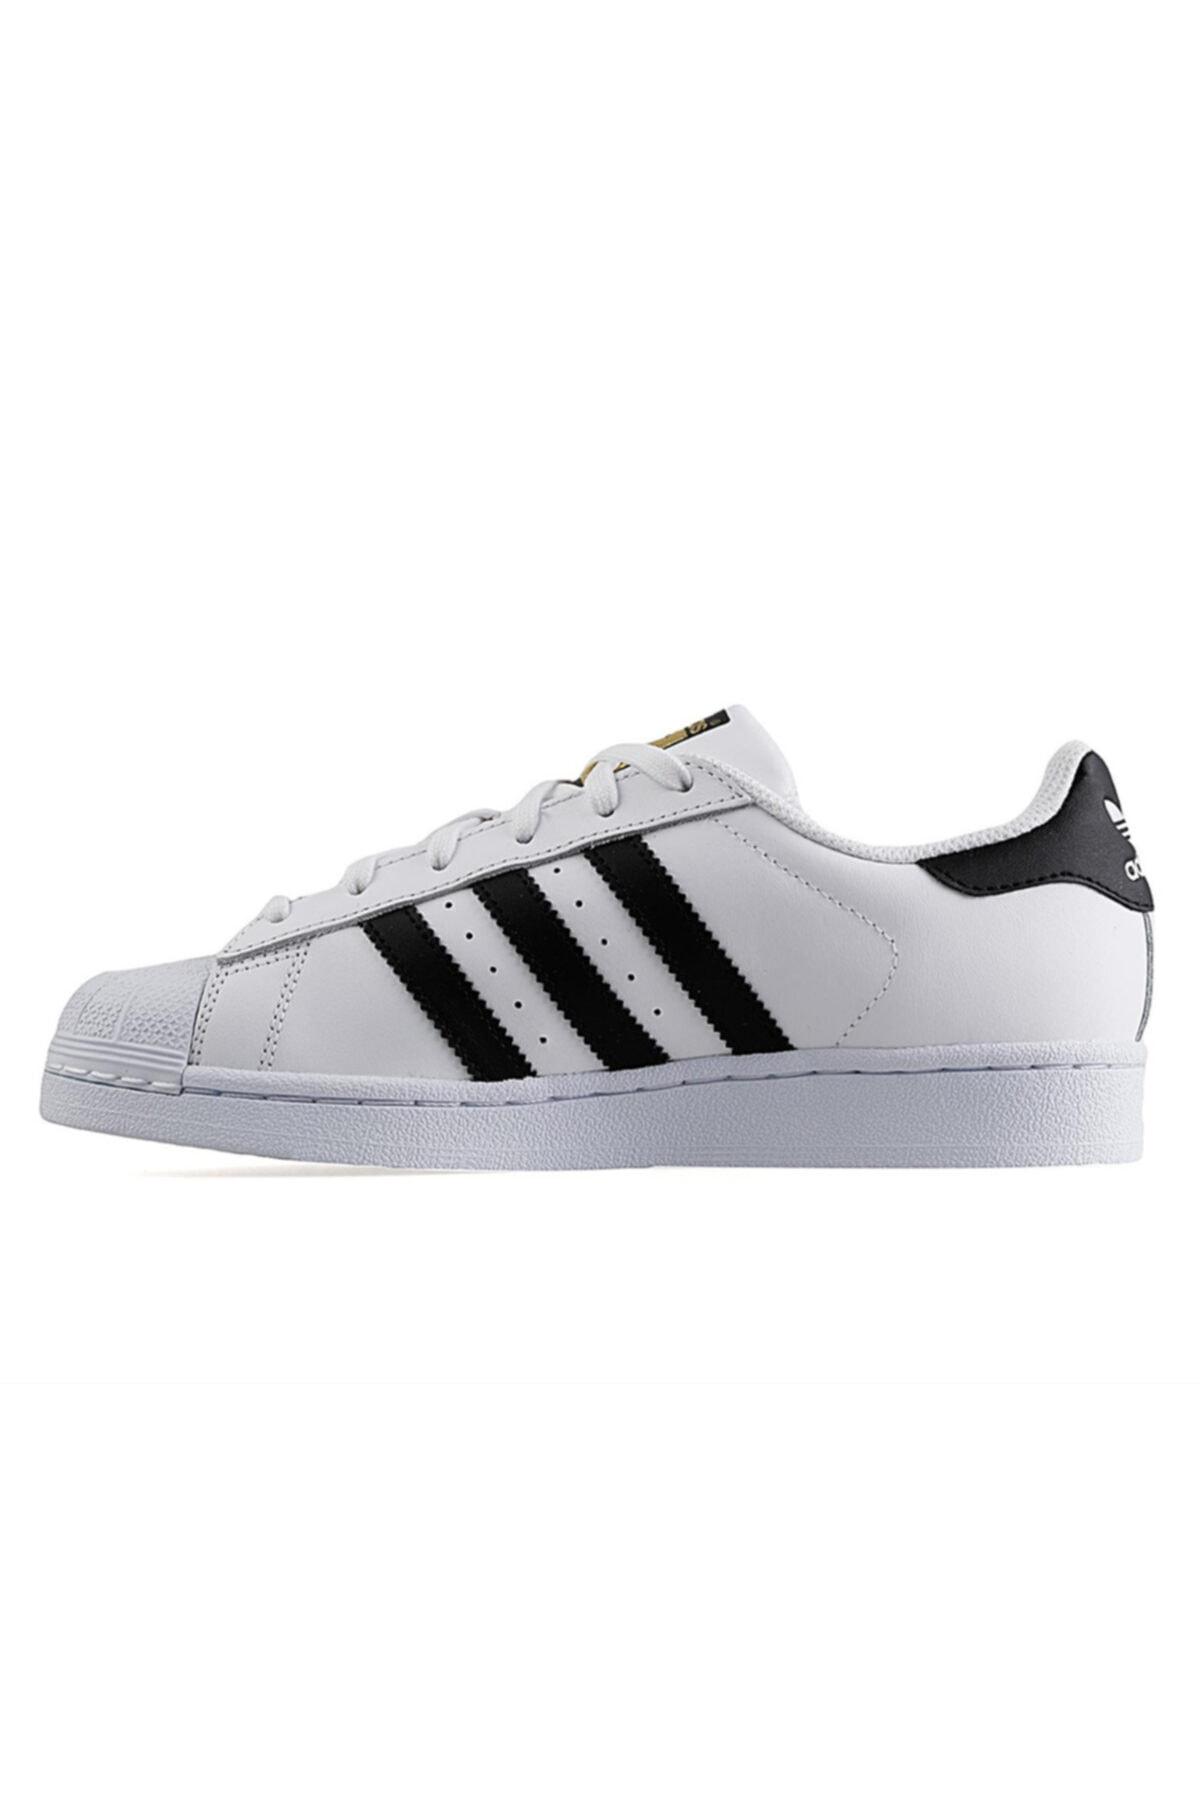 adidas Superstar Orginals Erkek Spor Ayakkabı 1